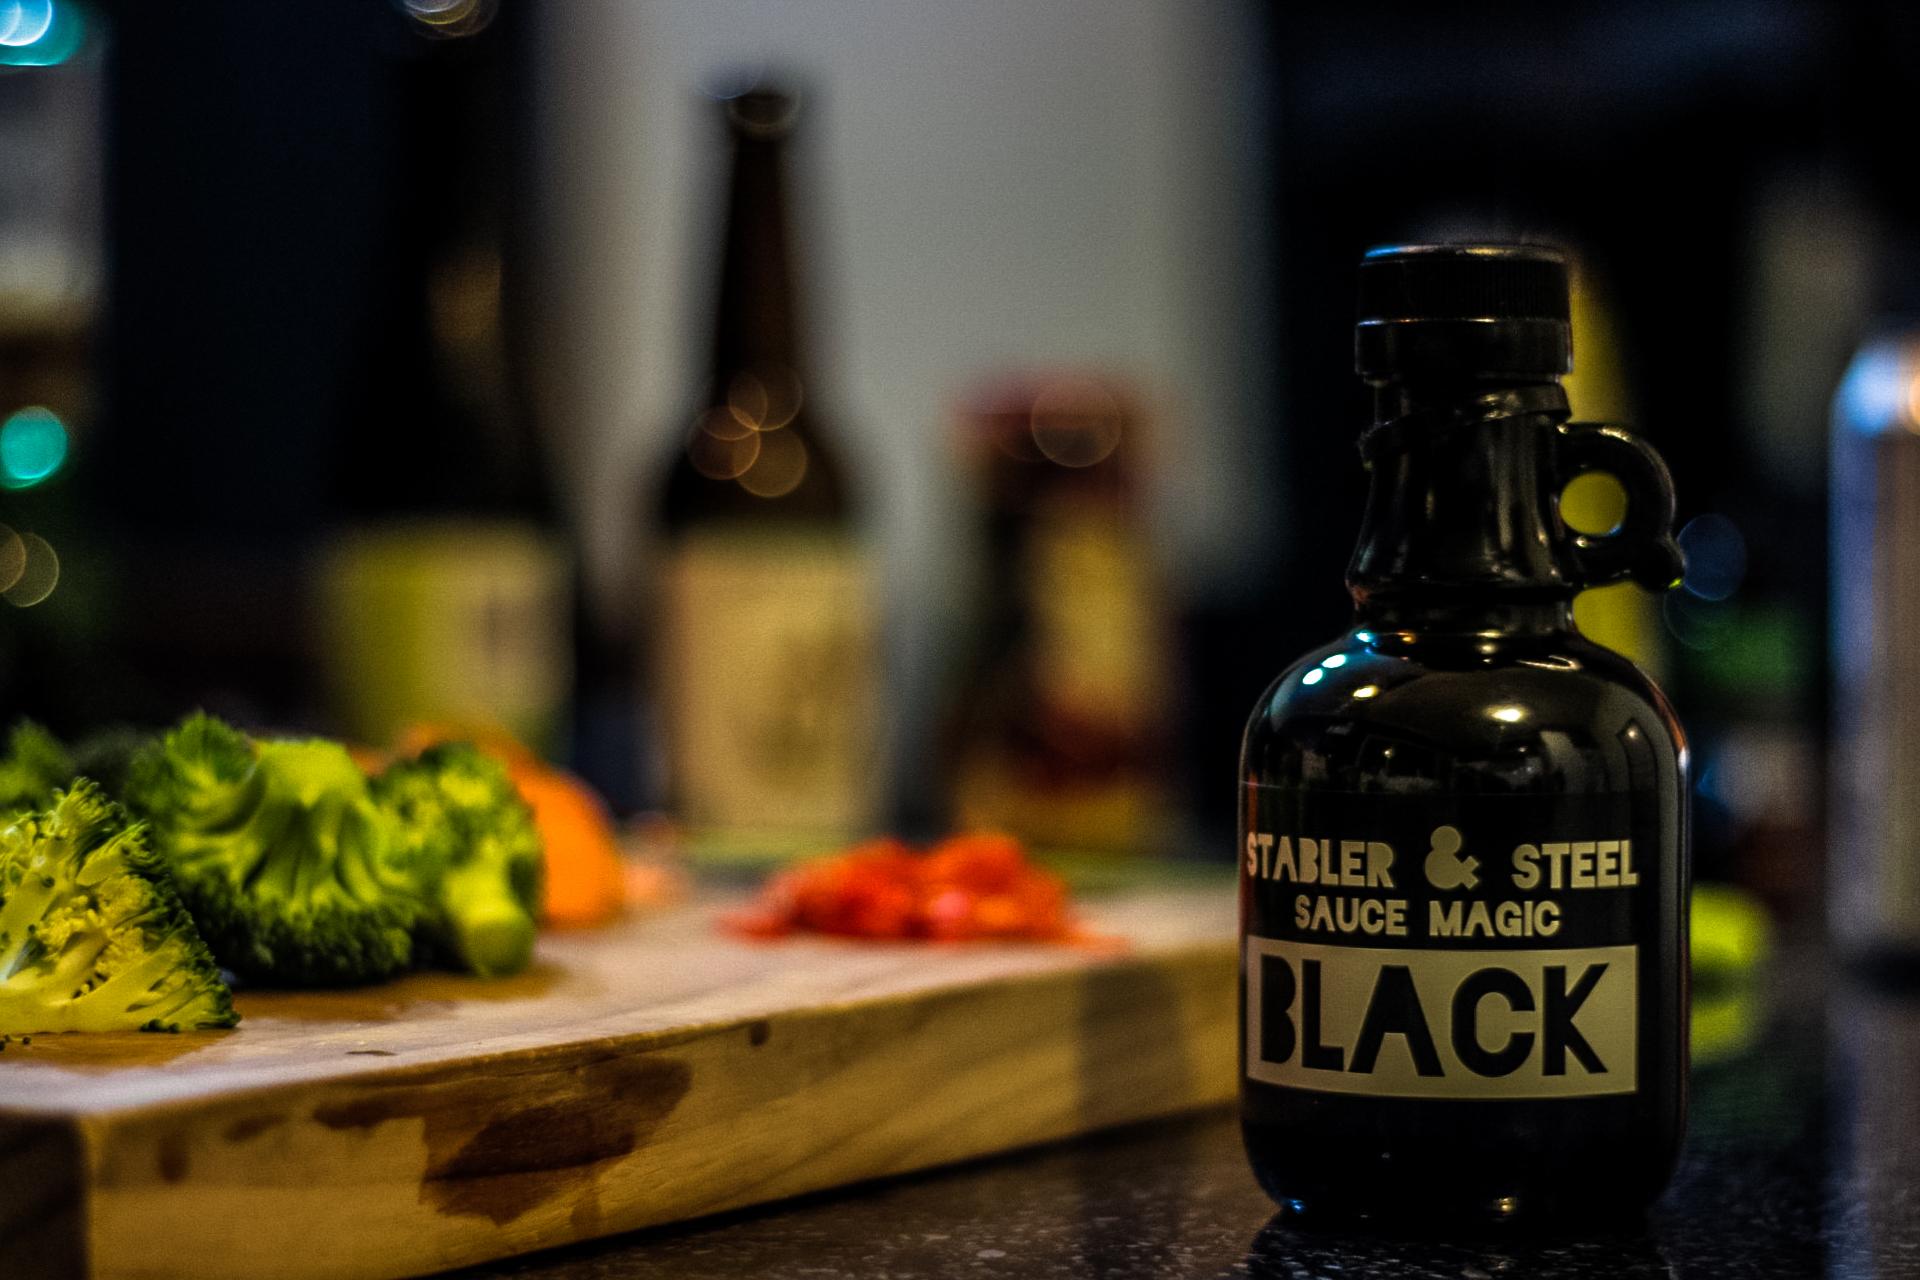 Black_06.jpg